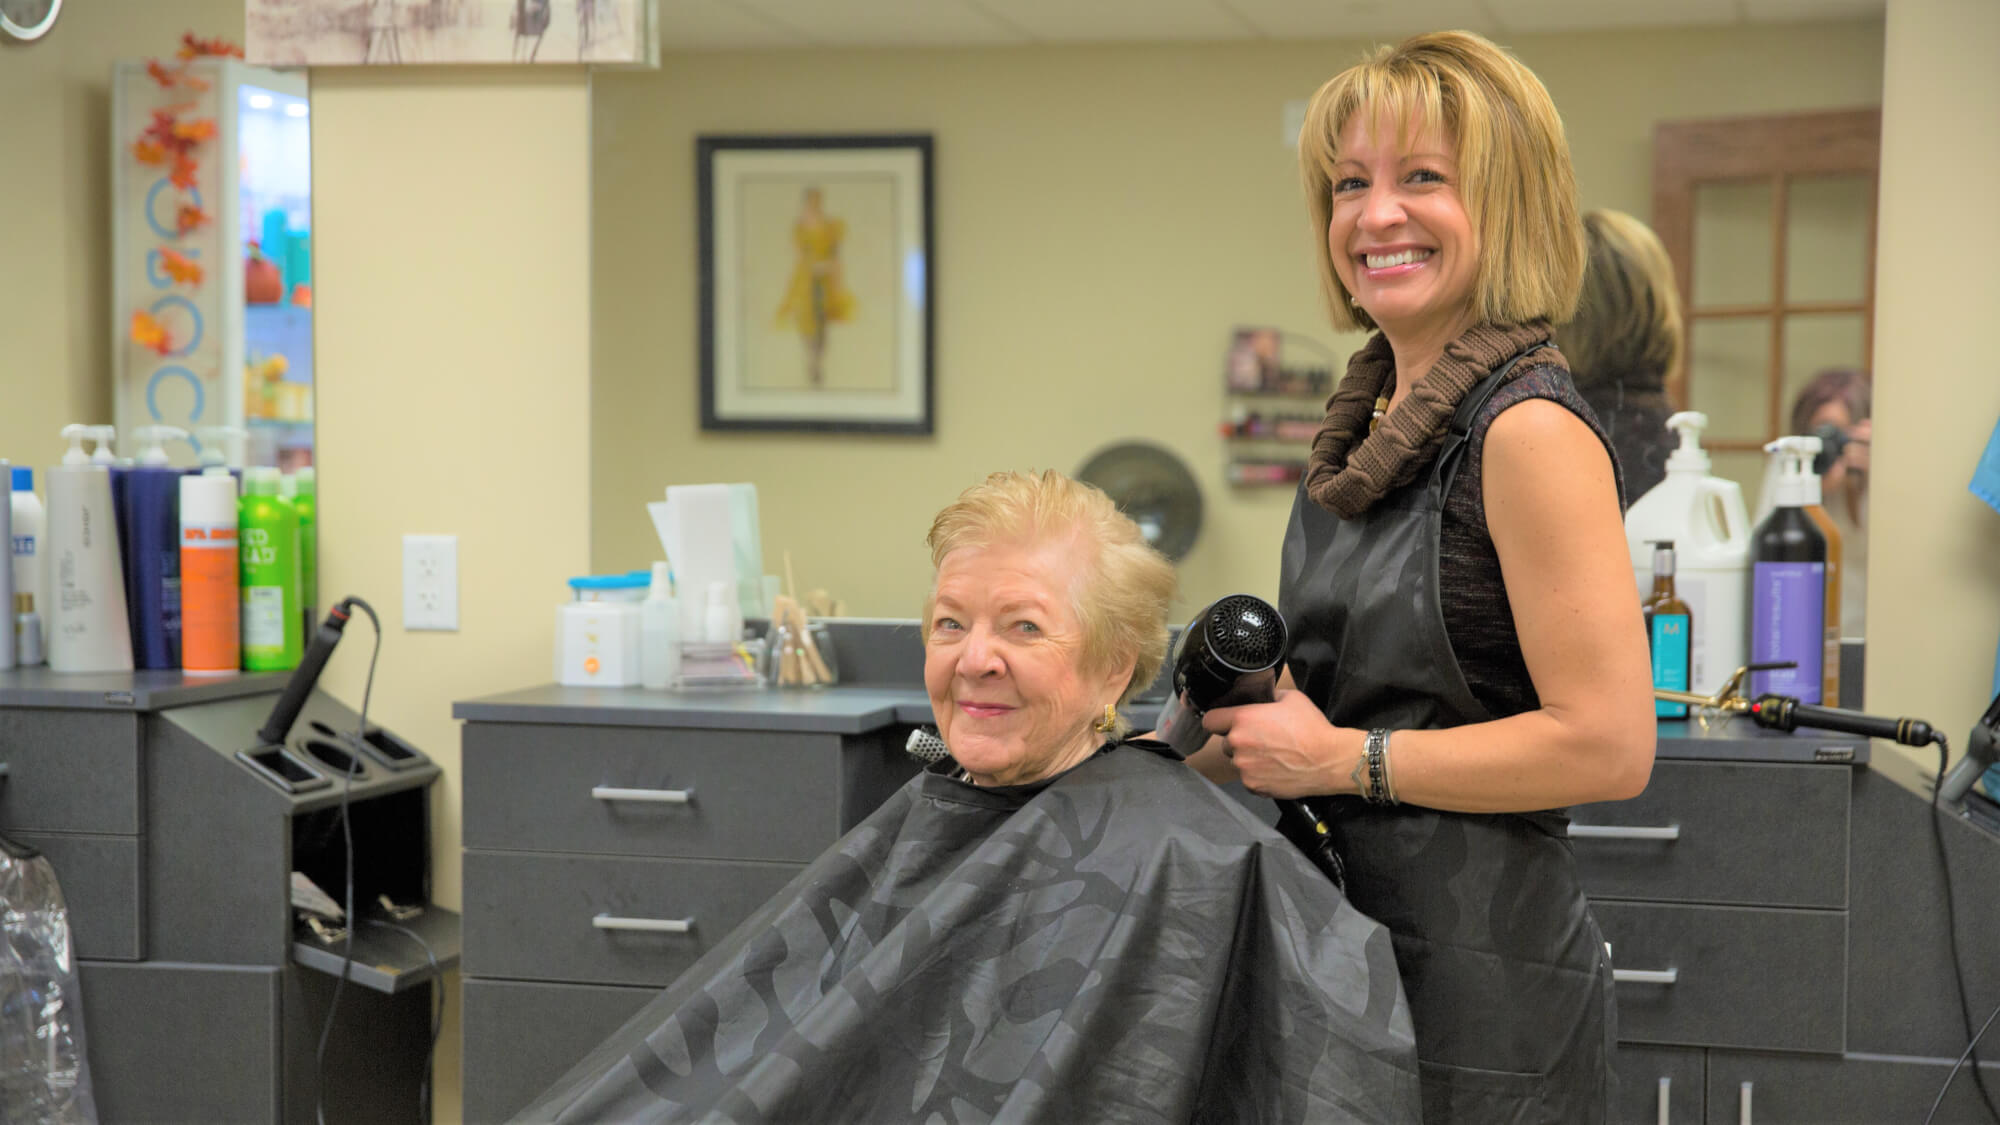 Resident getting her hair done in the full-service hair salon at Coronado Villa